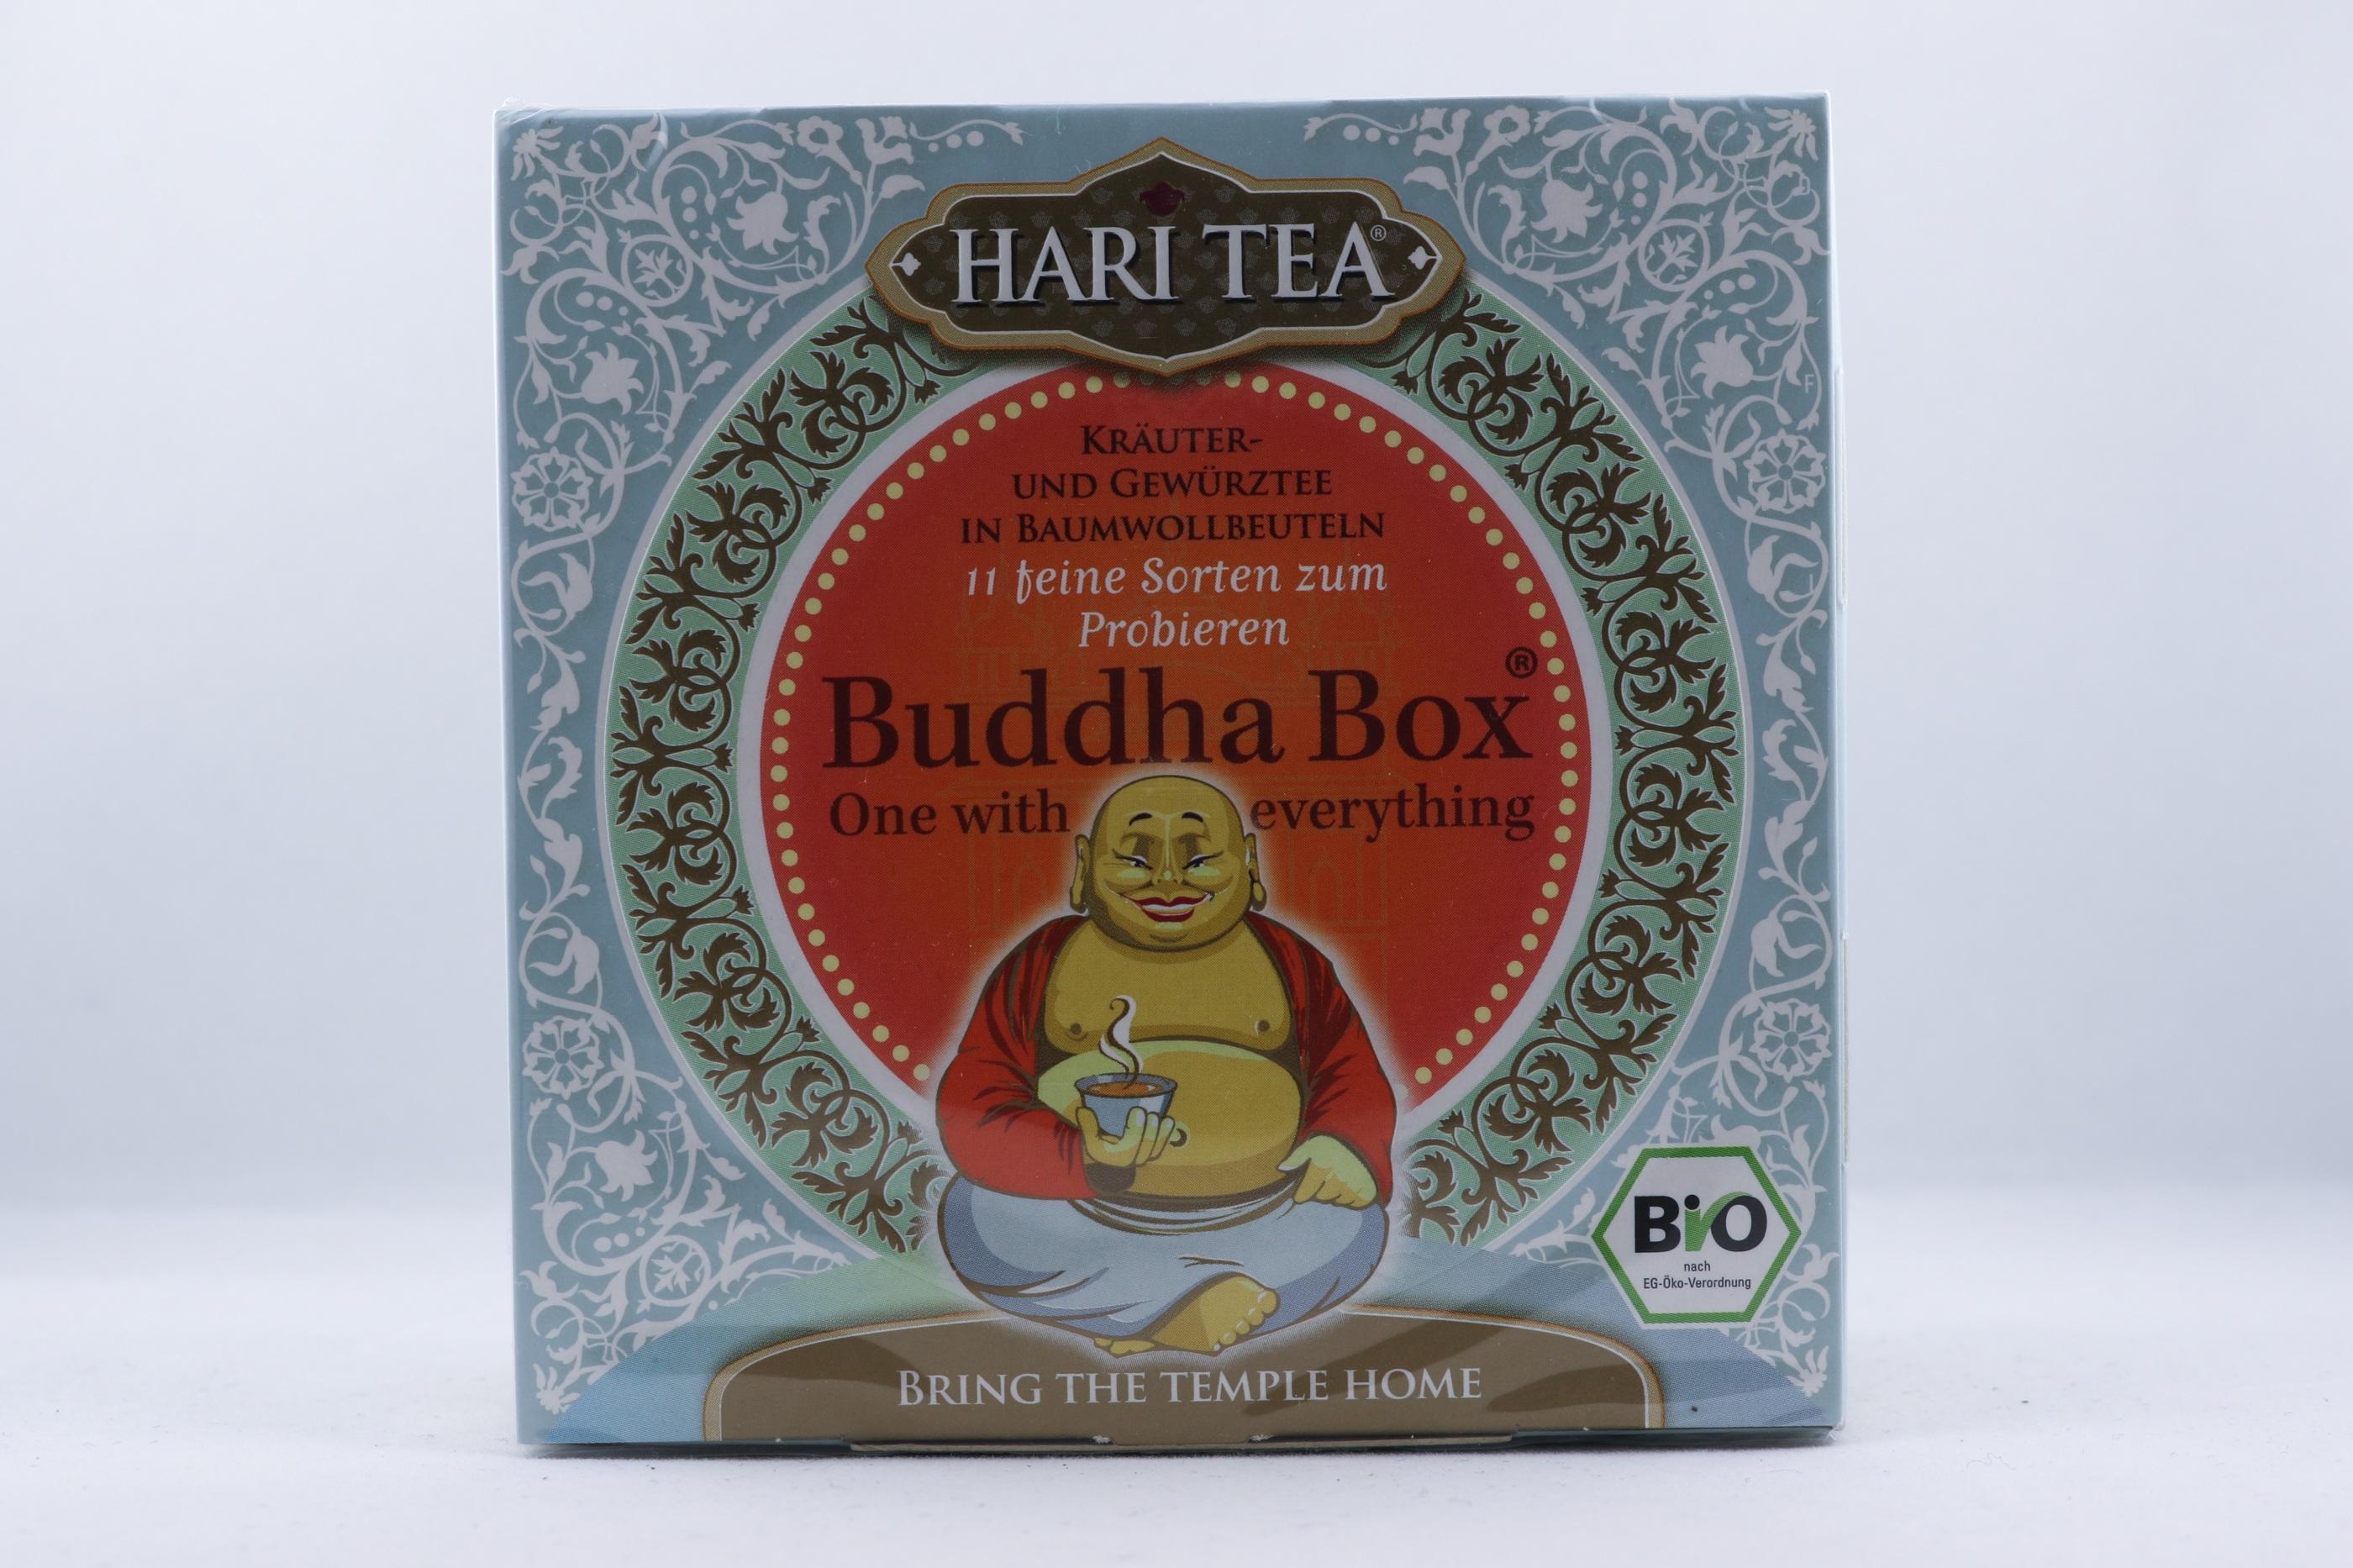 Buddha Box te Wellness Ayurveda Halmstadmassören Halmstad Sverige Sweden svensk eko ekologiskt